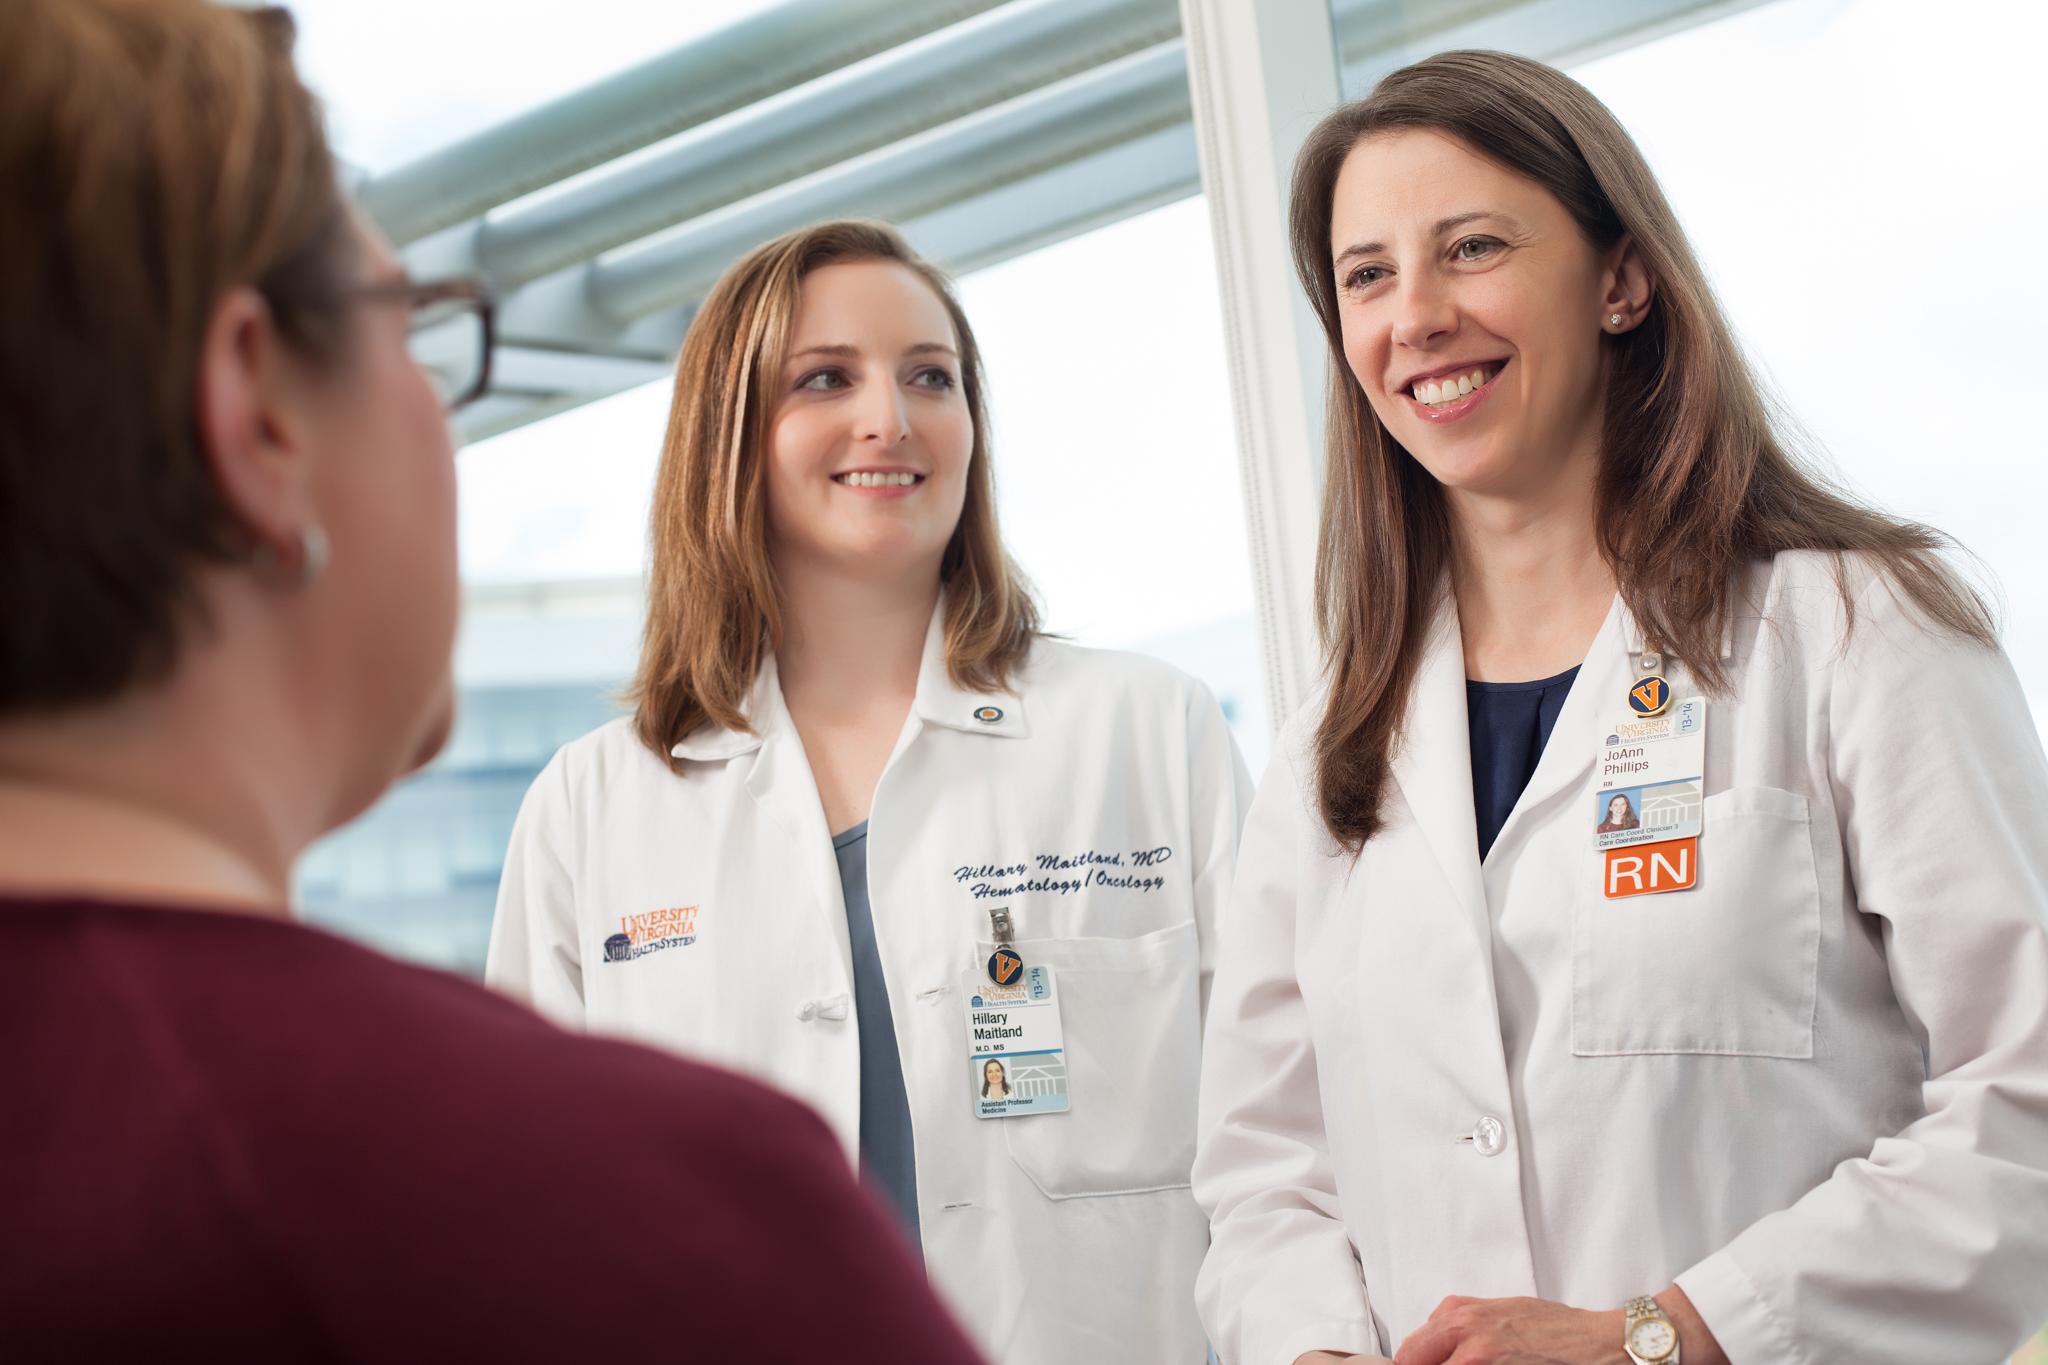 14029 Cancer Center Dr. Maitland and JoAnn Phillips 028 final.jpg